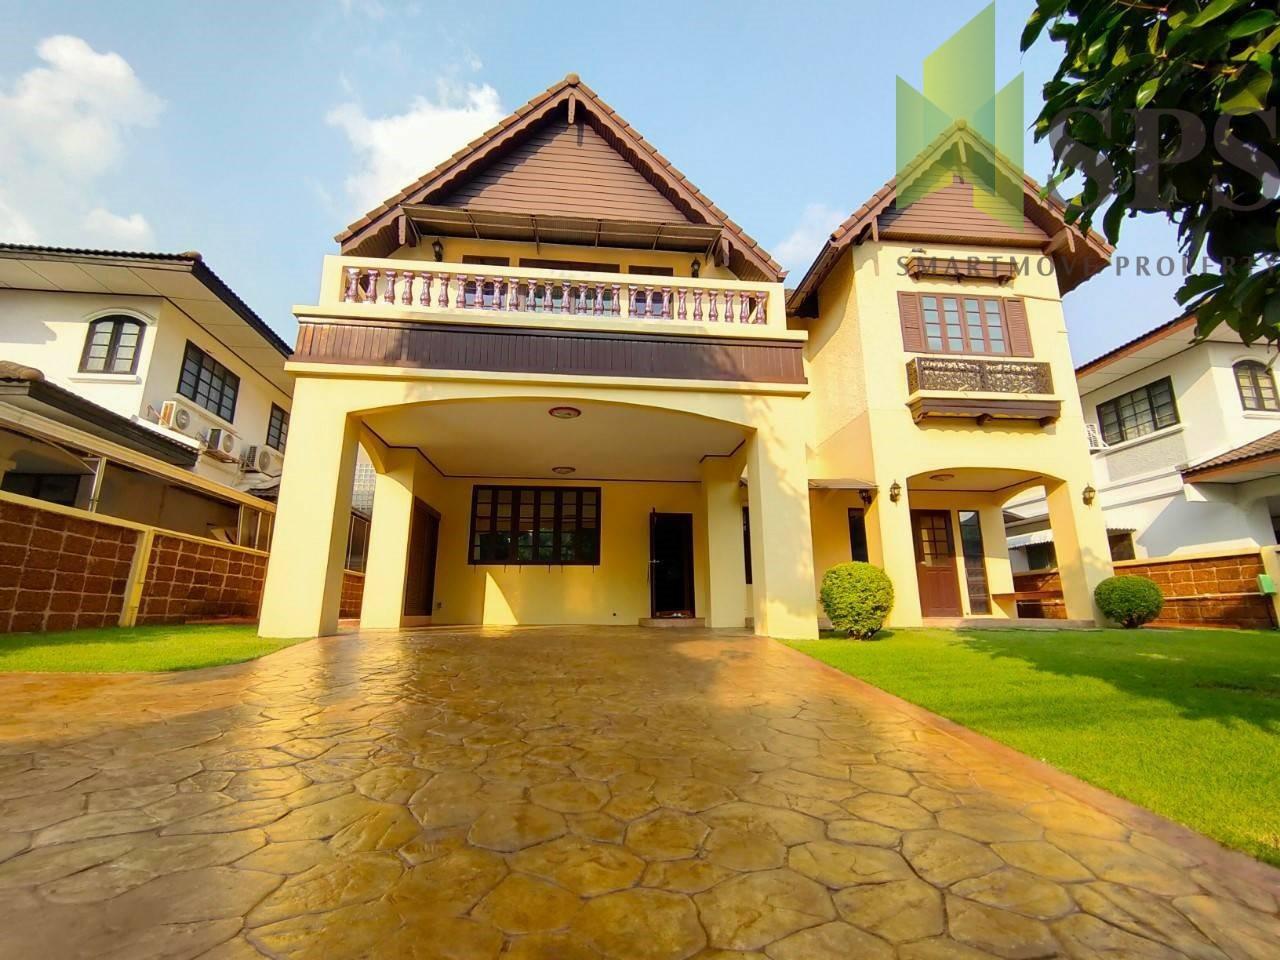 For Rent Single house Ladawan Srinakarin บ้านเดี่ยวหมู่บ้านลดาวัลย์ศรีนครินทร์ ( SPSPE341)